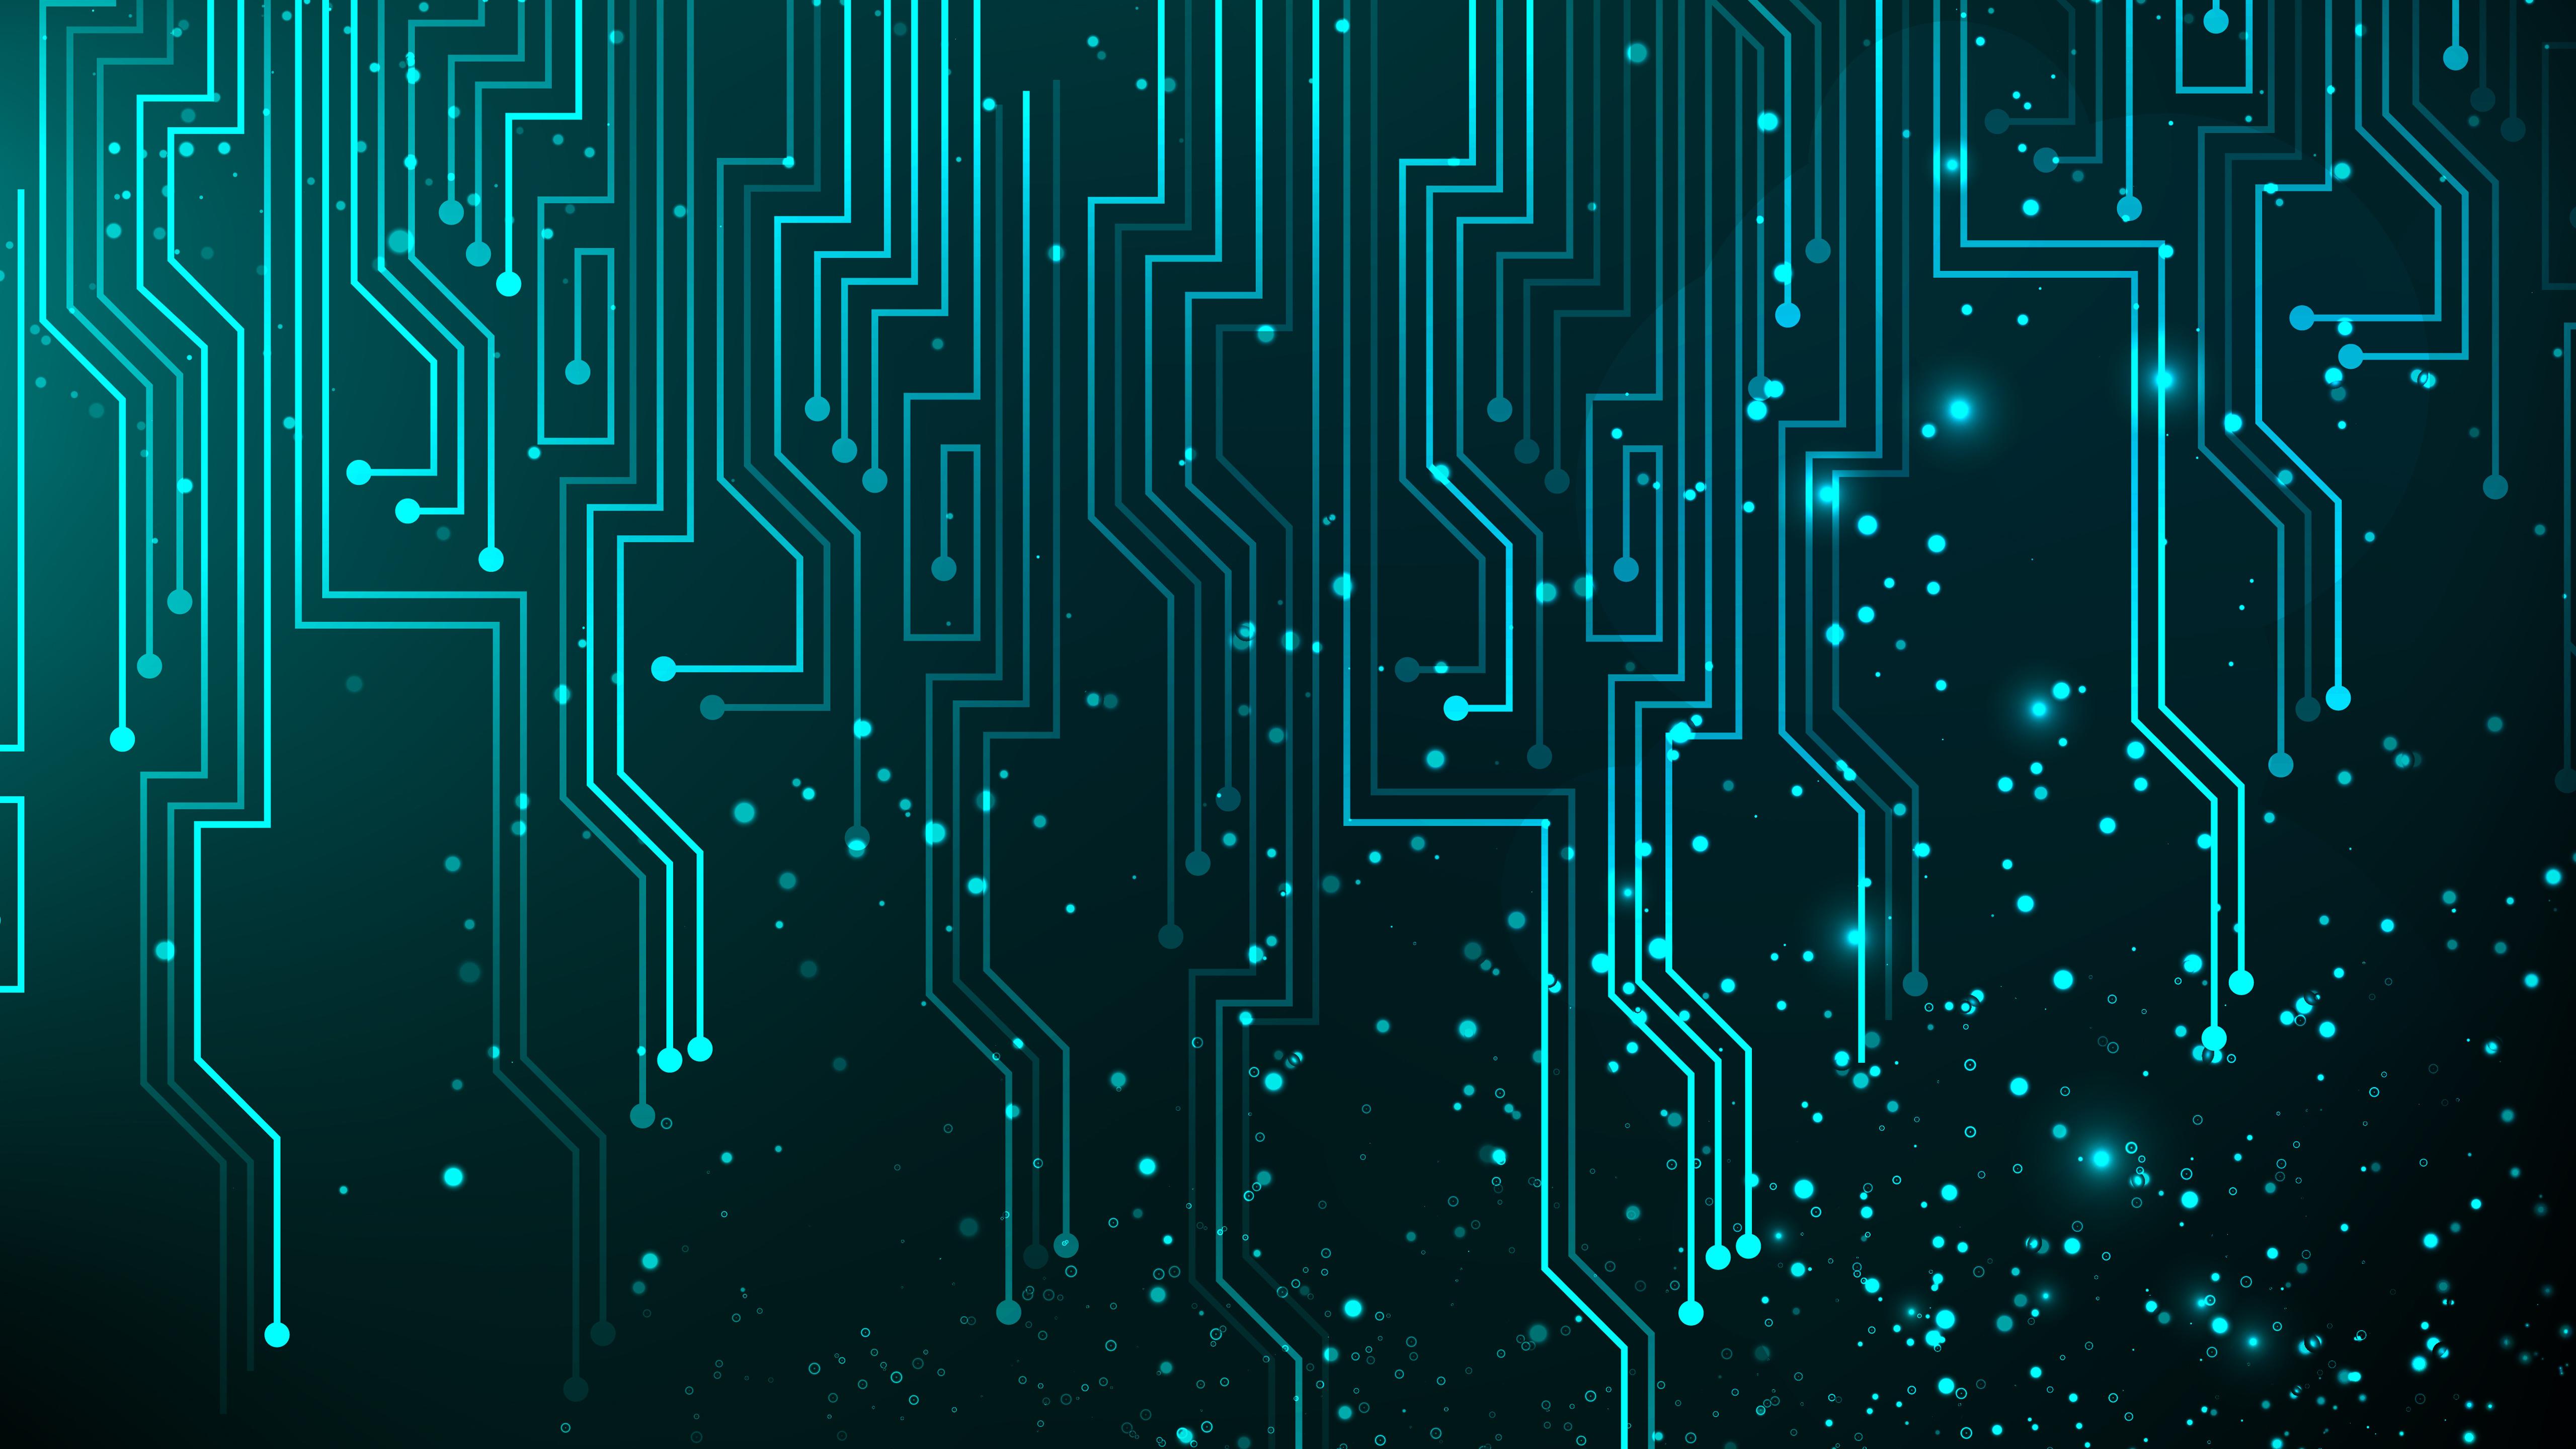 Digital Art Circuit Abstract Lines 5120x2880 5k Wallpaper